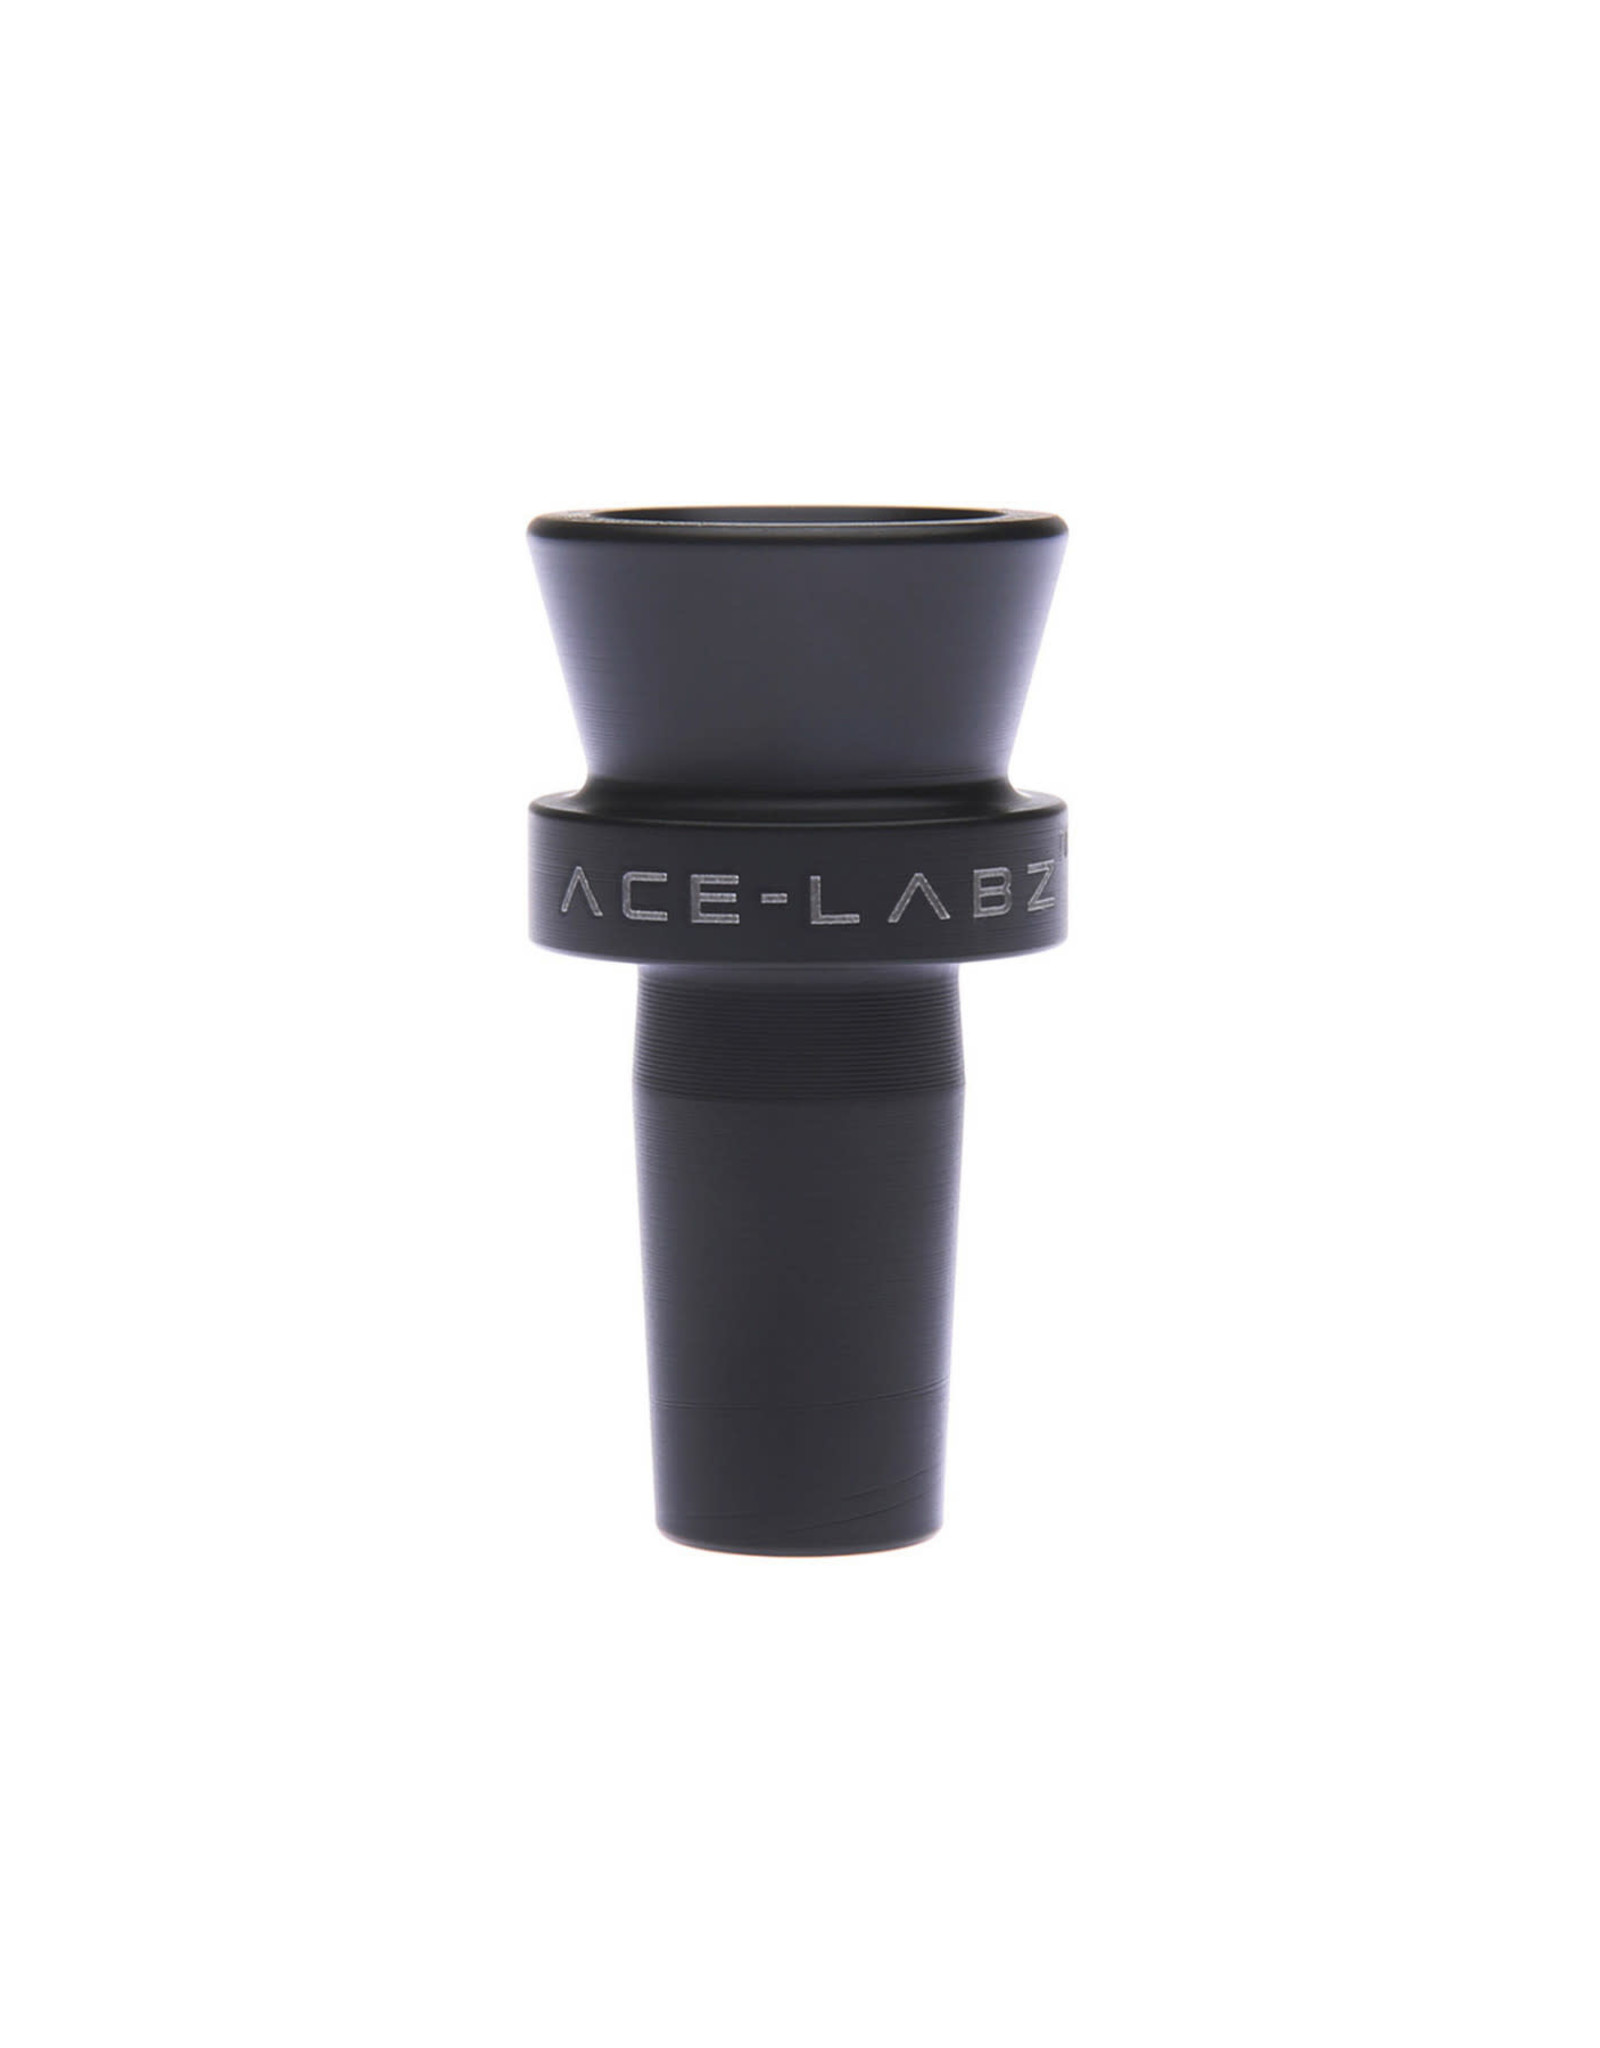 ACE-LABZ TX819 14mm Unbreakable Metal Bowl Black